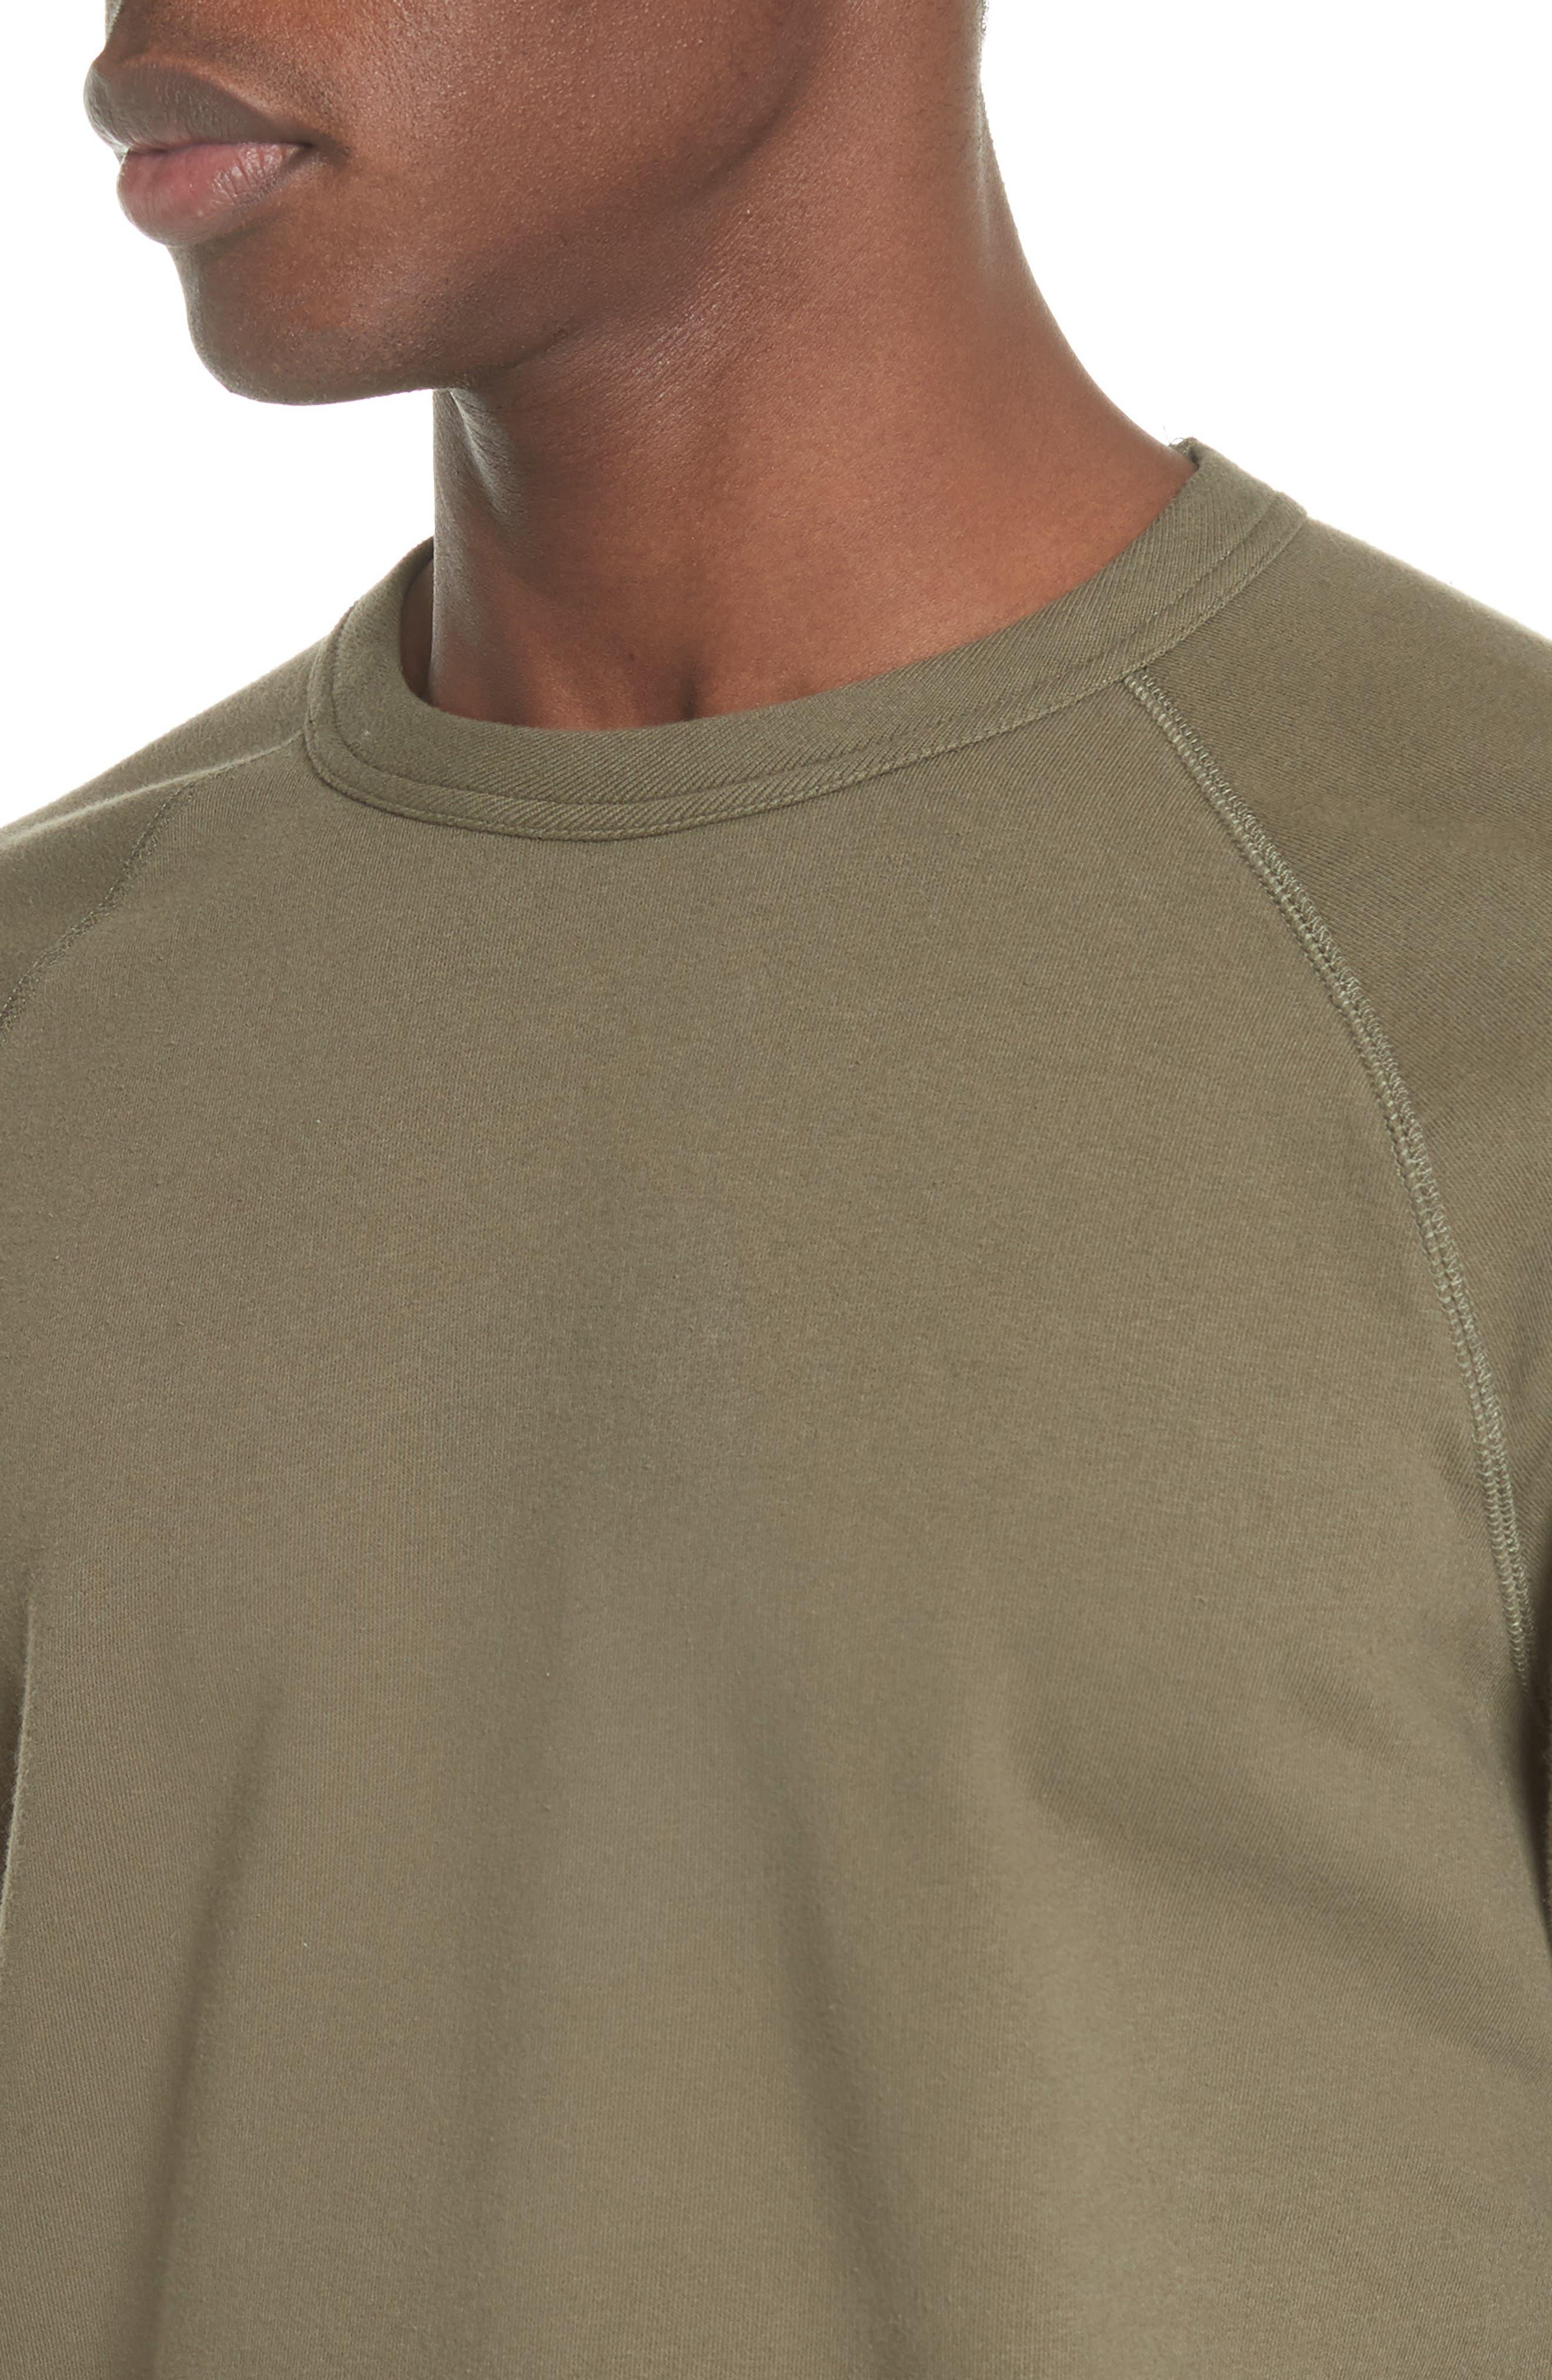 Core Crewneck Sweatshirt,                             Alternate thumbnail 4, color,                             Olive